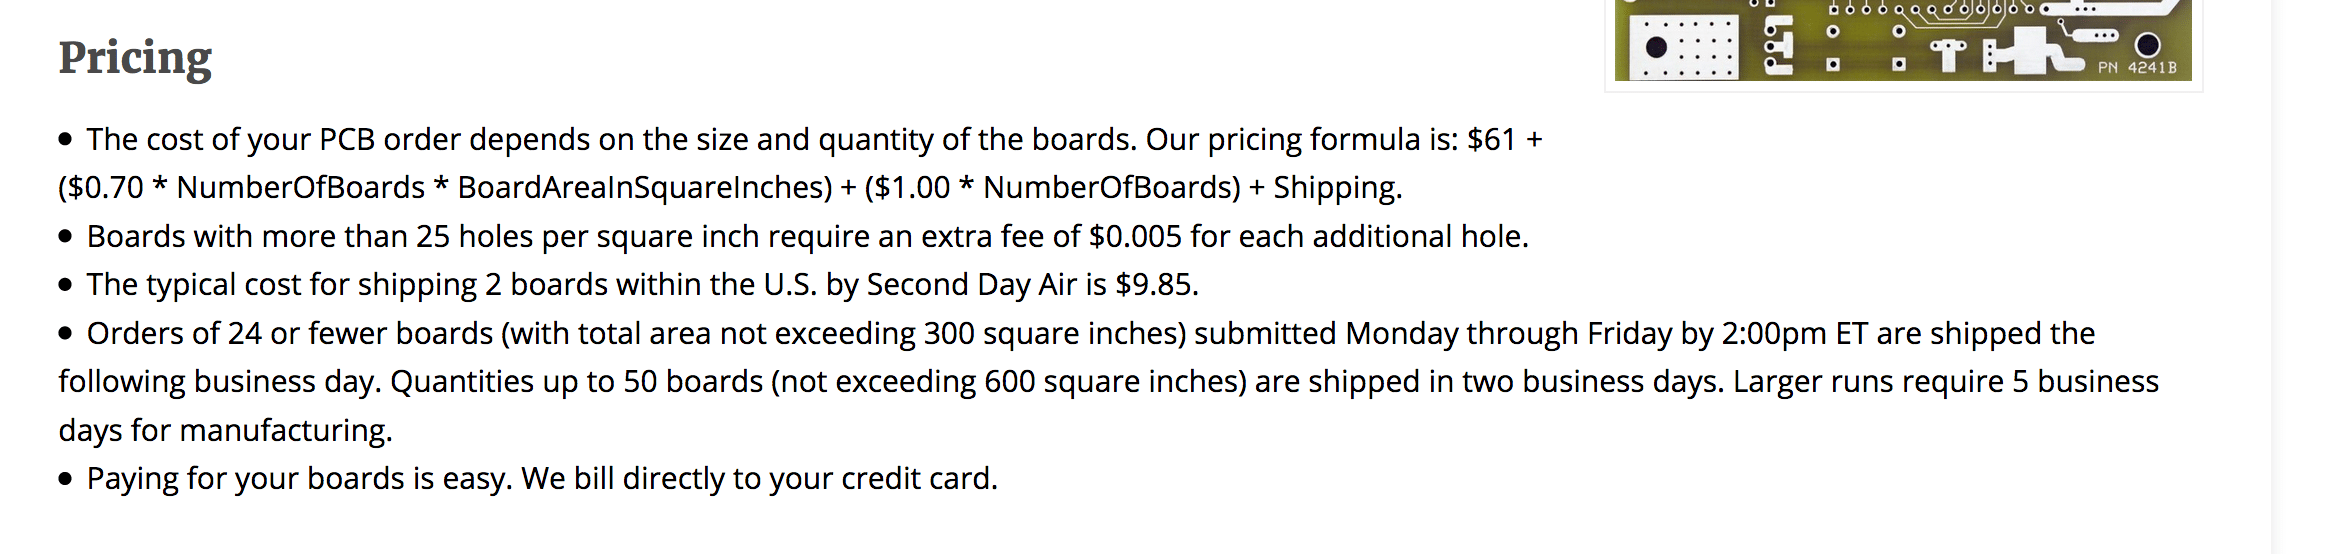 expensive to prototype